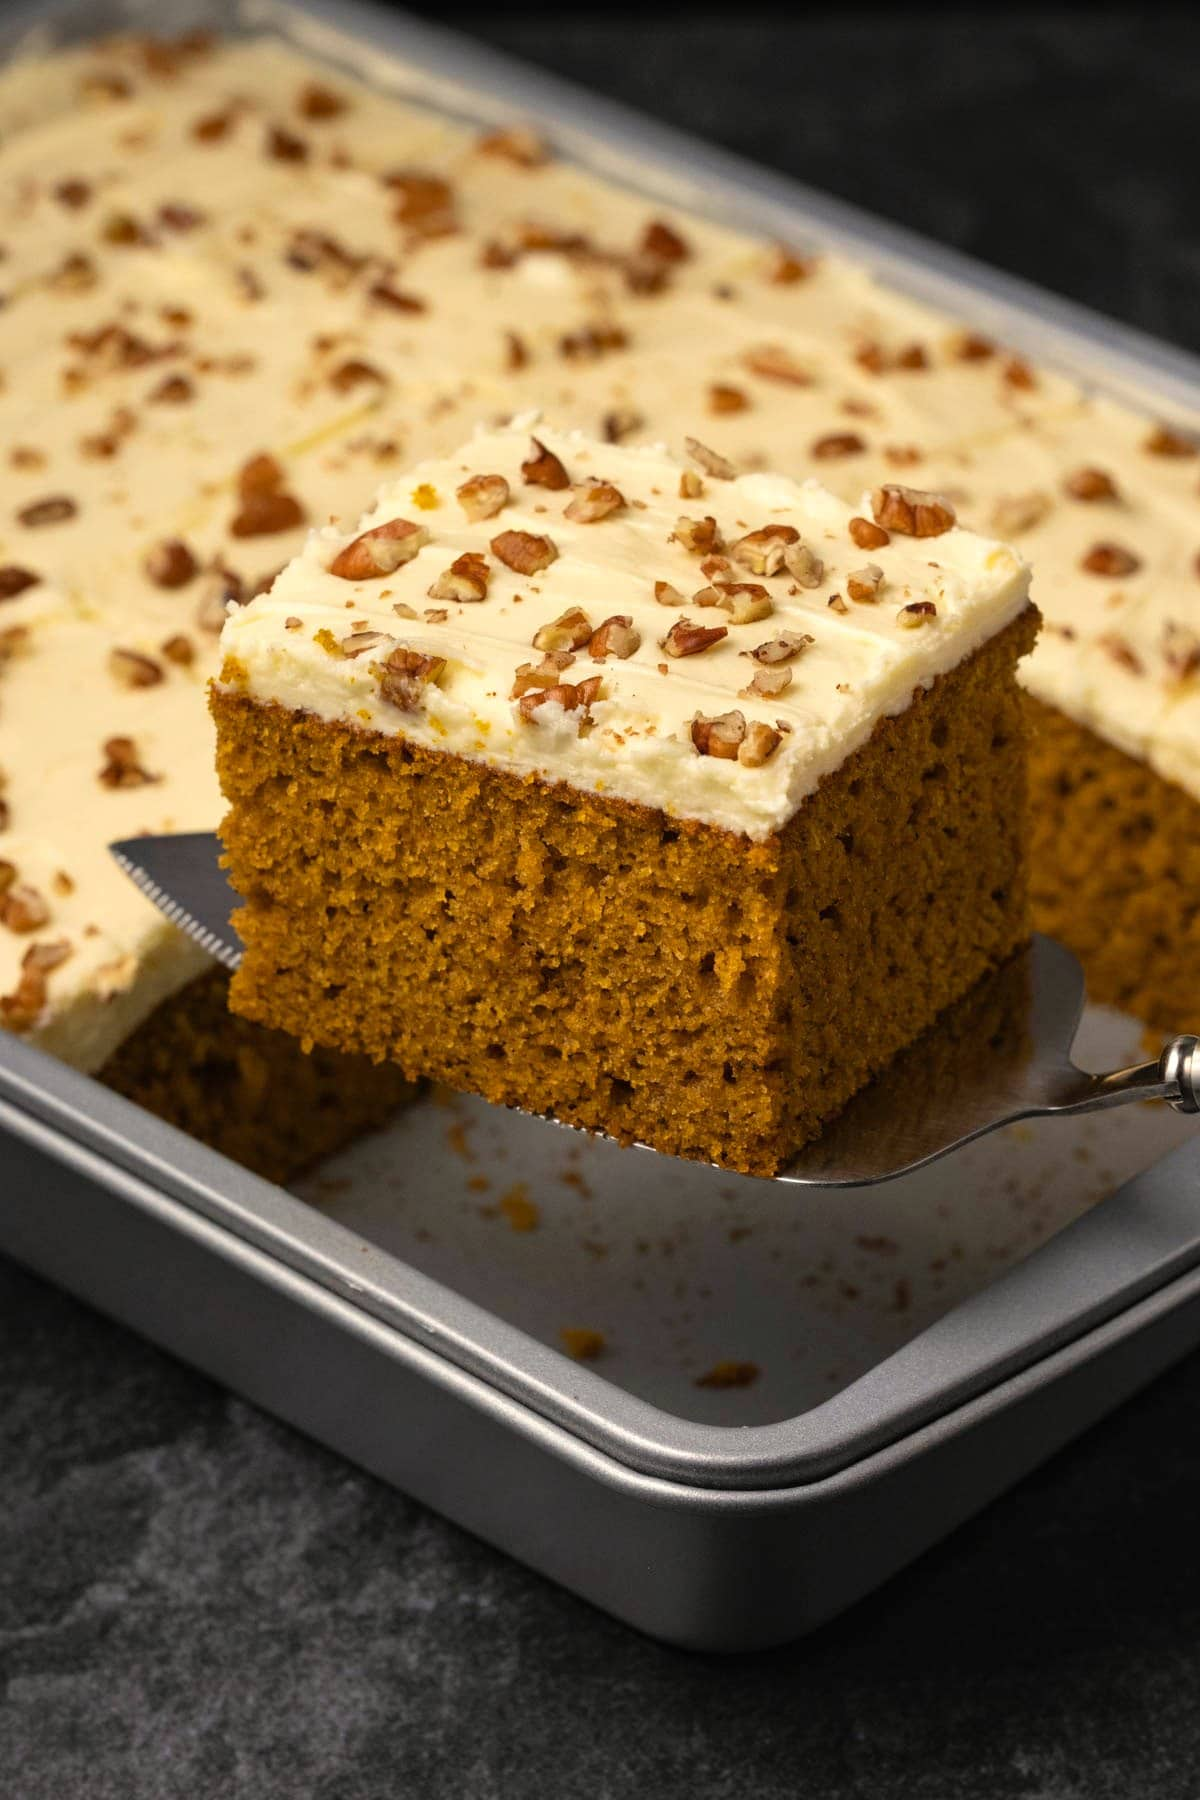 Slice of pumpkin cake on a cake lifter ready to serve.